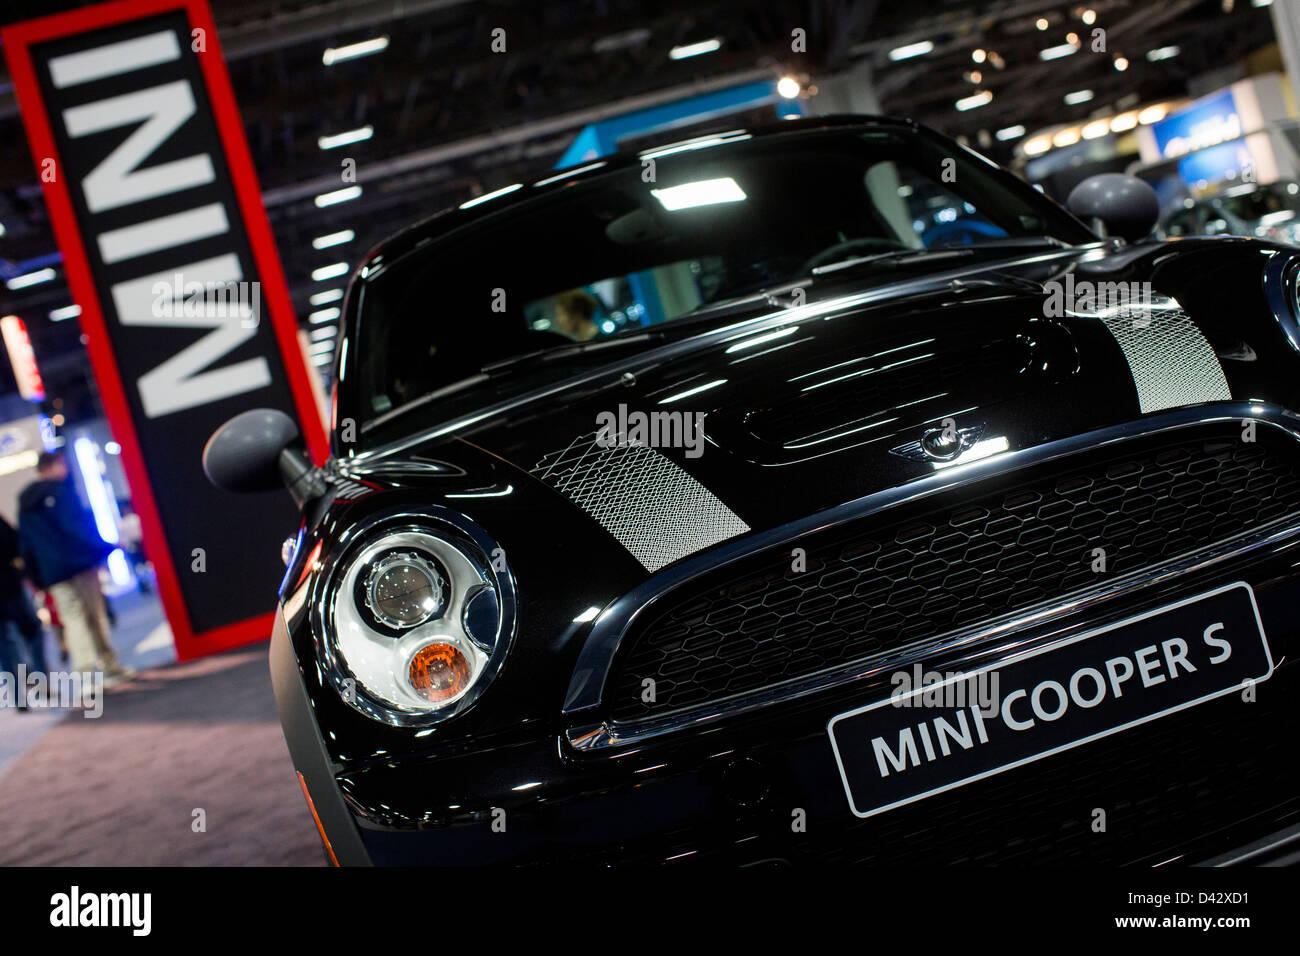 A Mini Cooper S on display at the 2013 Washington, DC Auto Show. - Stock Image